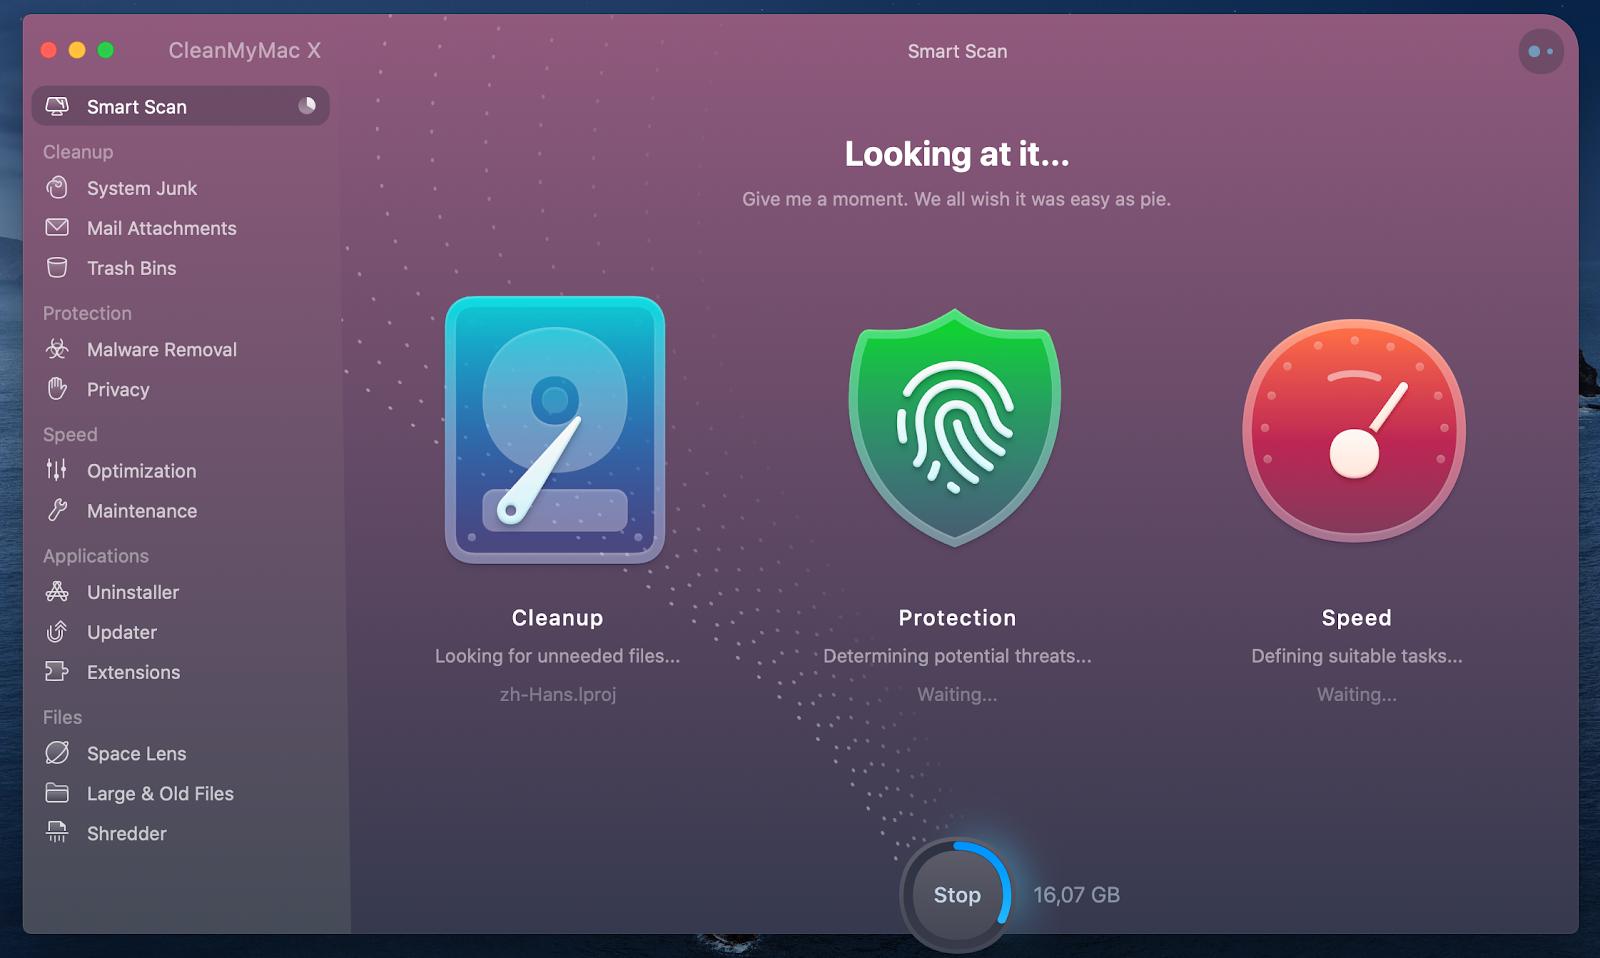 CleanMyMac X app